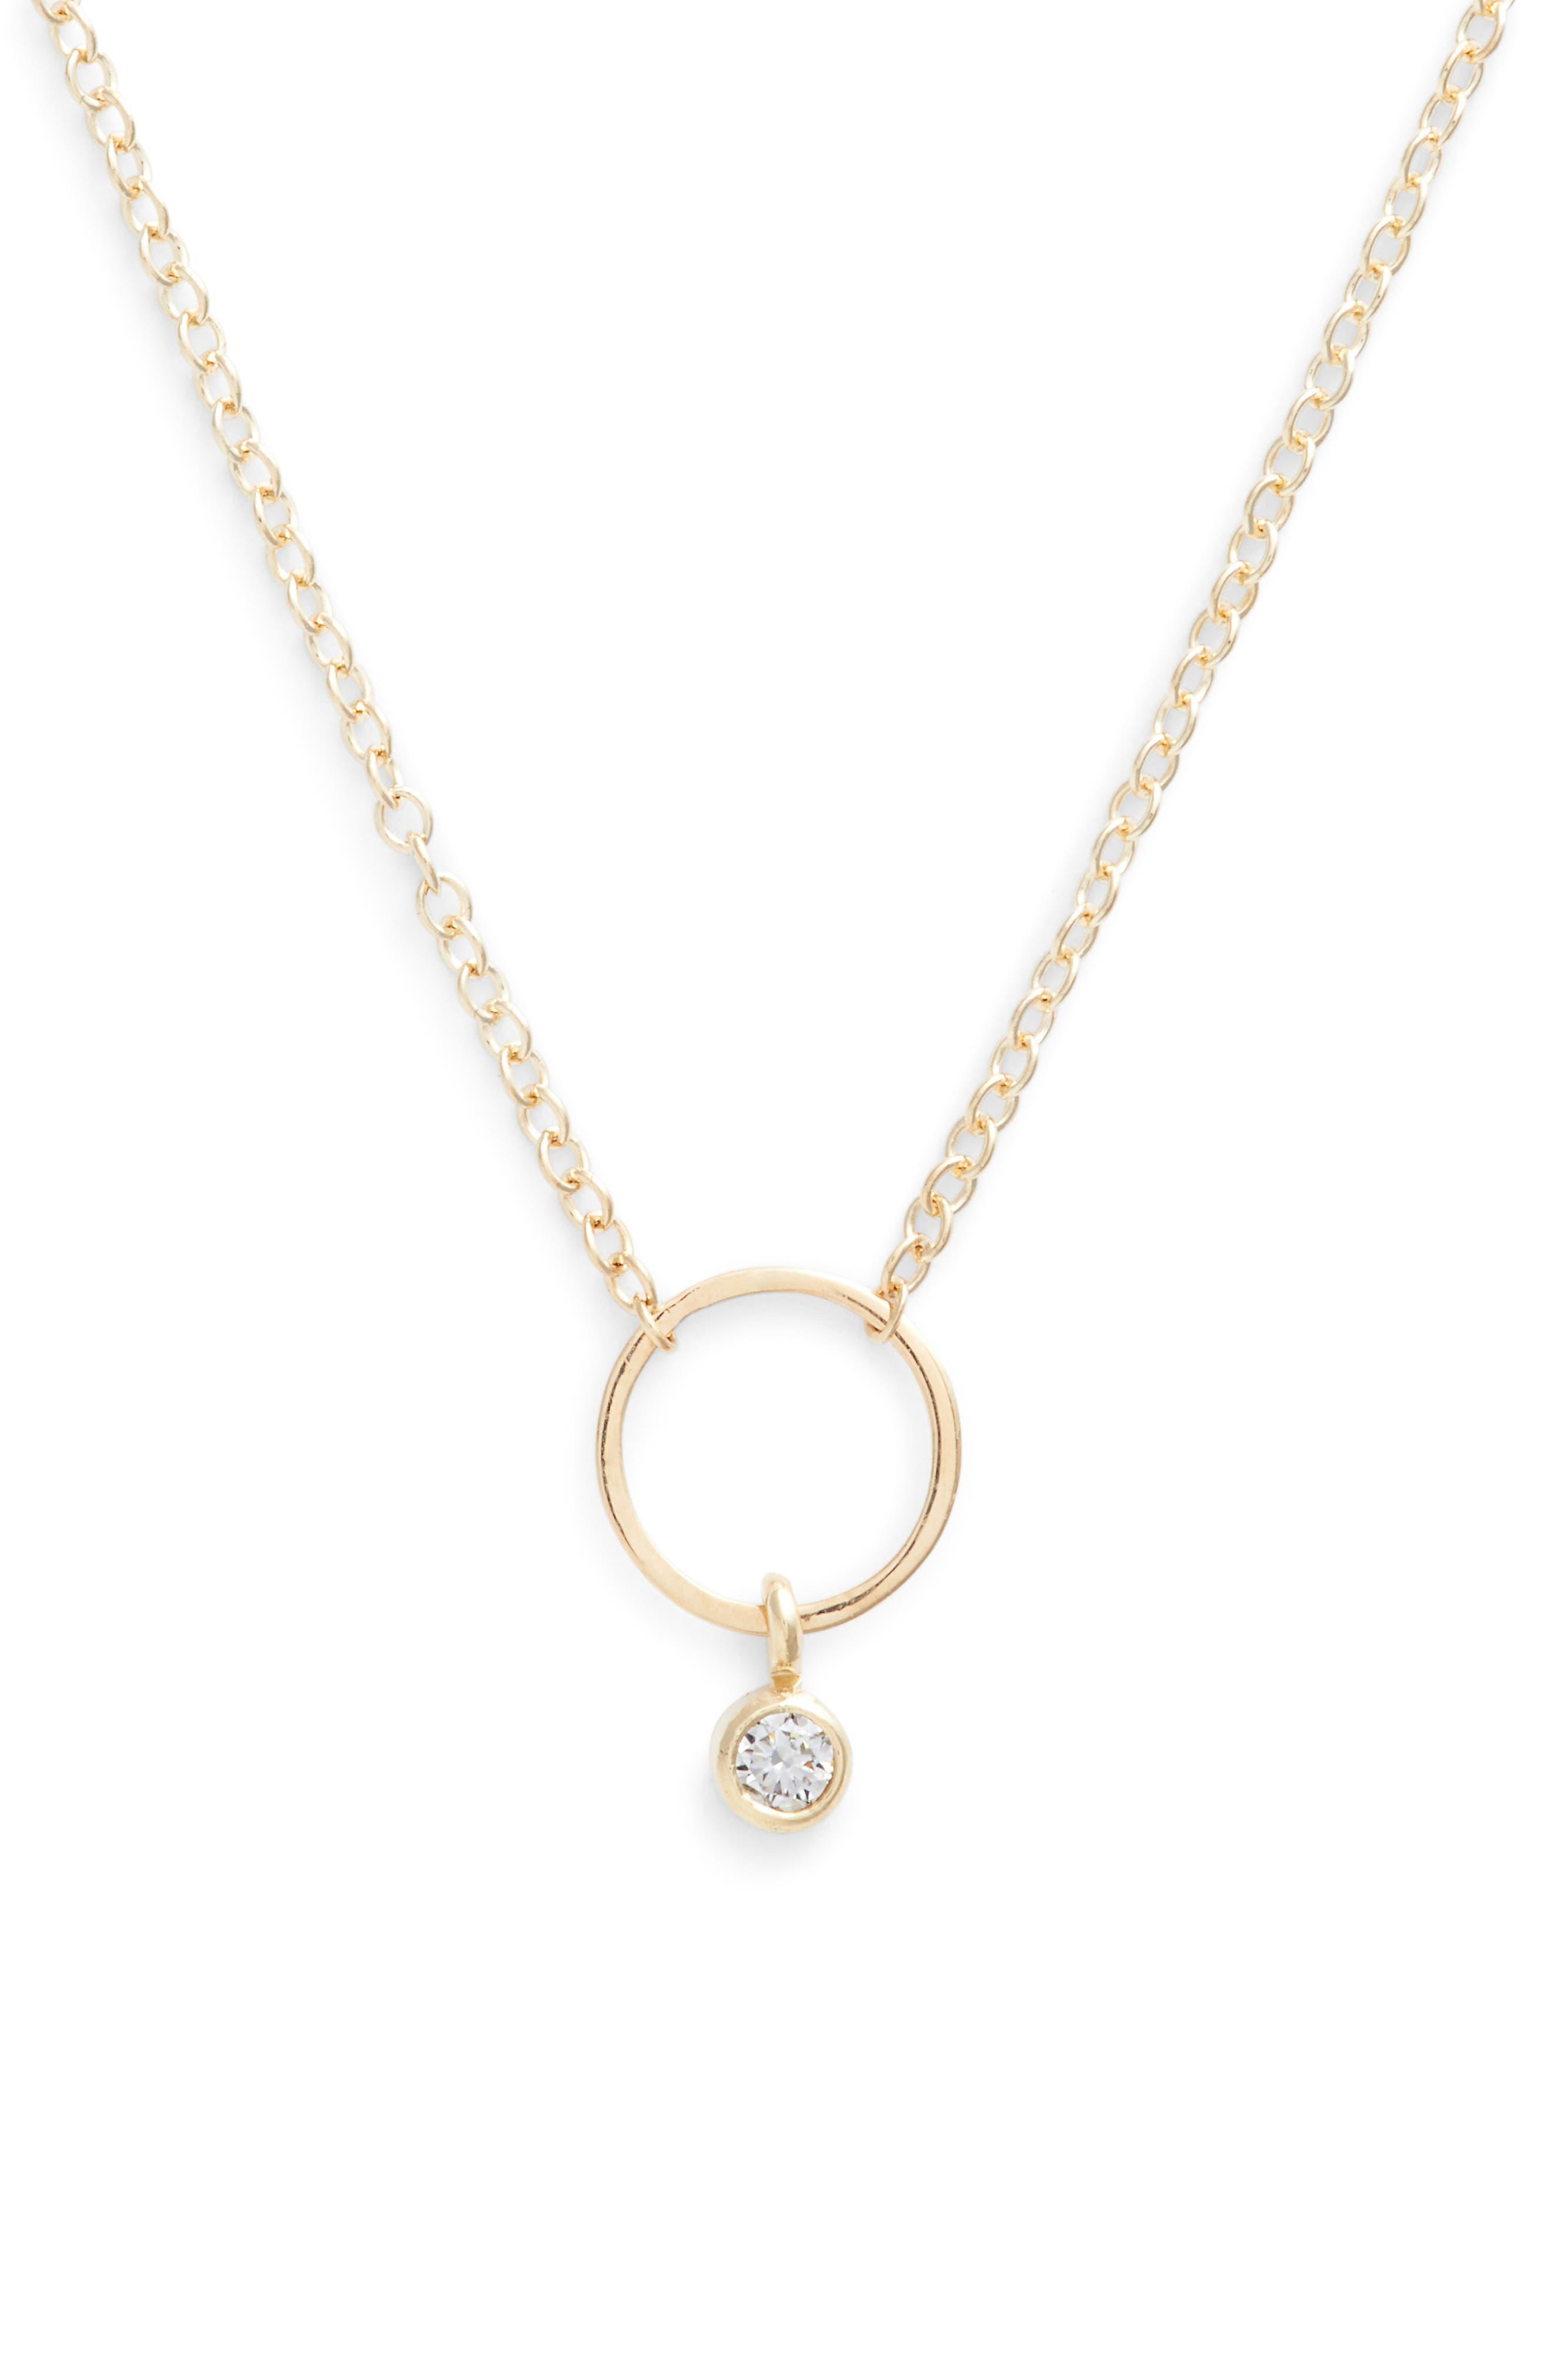 Dangling Diamond Circle Pendant Necklace,                             Main thumbnail 1, color,                             YELLOW GOLD